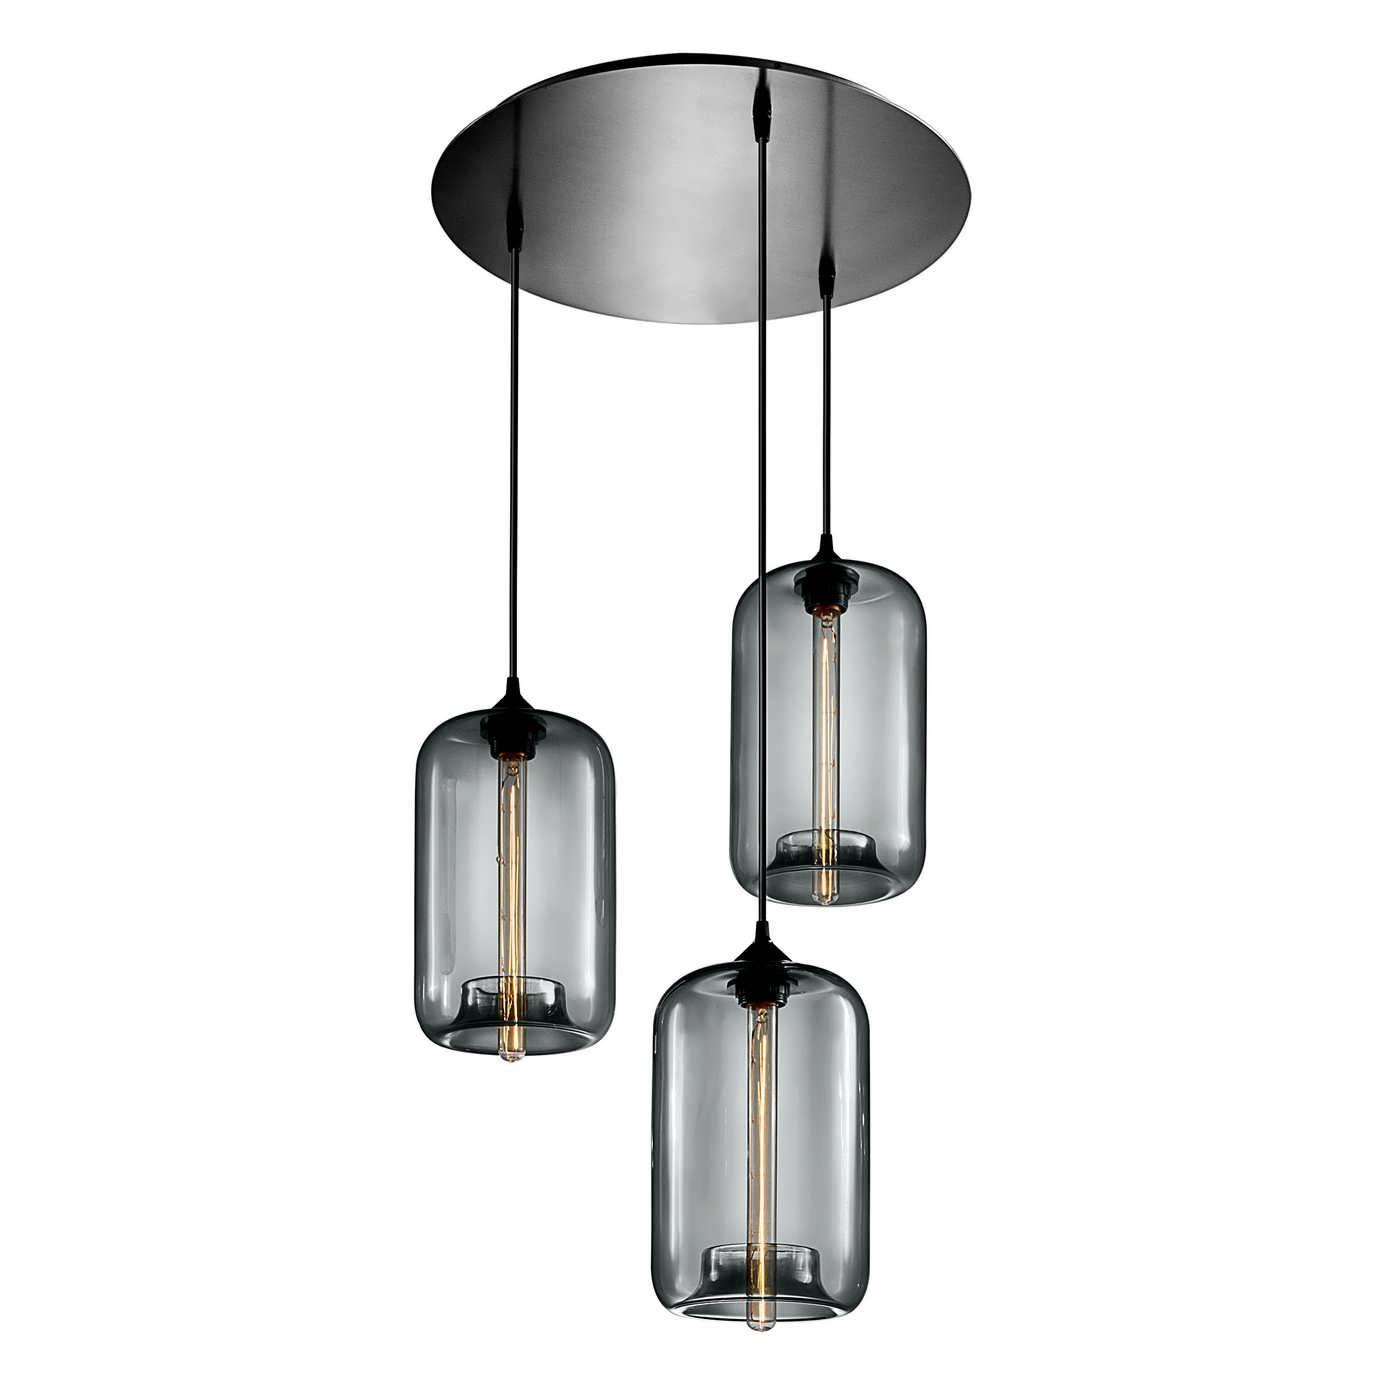 Chandelier : Round Pendant Light Bathroom Pendant Lighting Pendant intended for Round Glass Pendant Lights (Image 1 of 15)